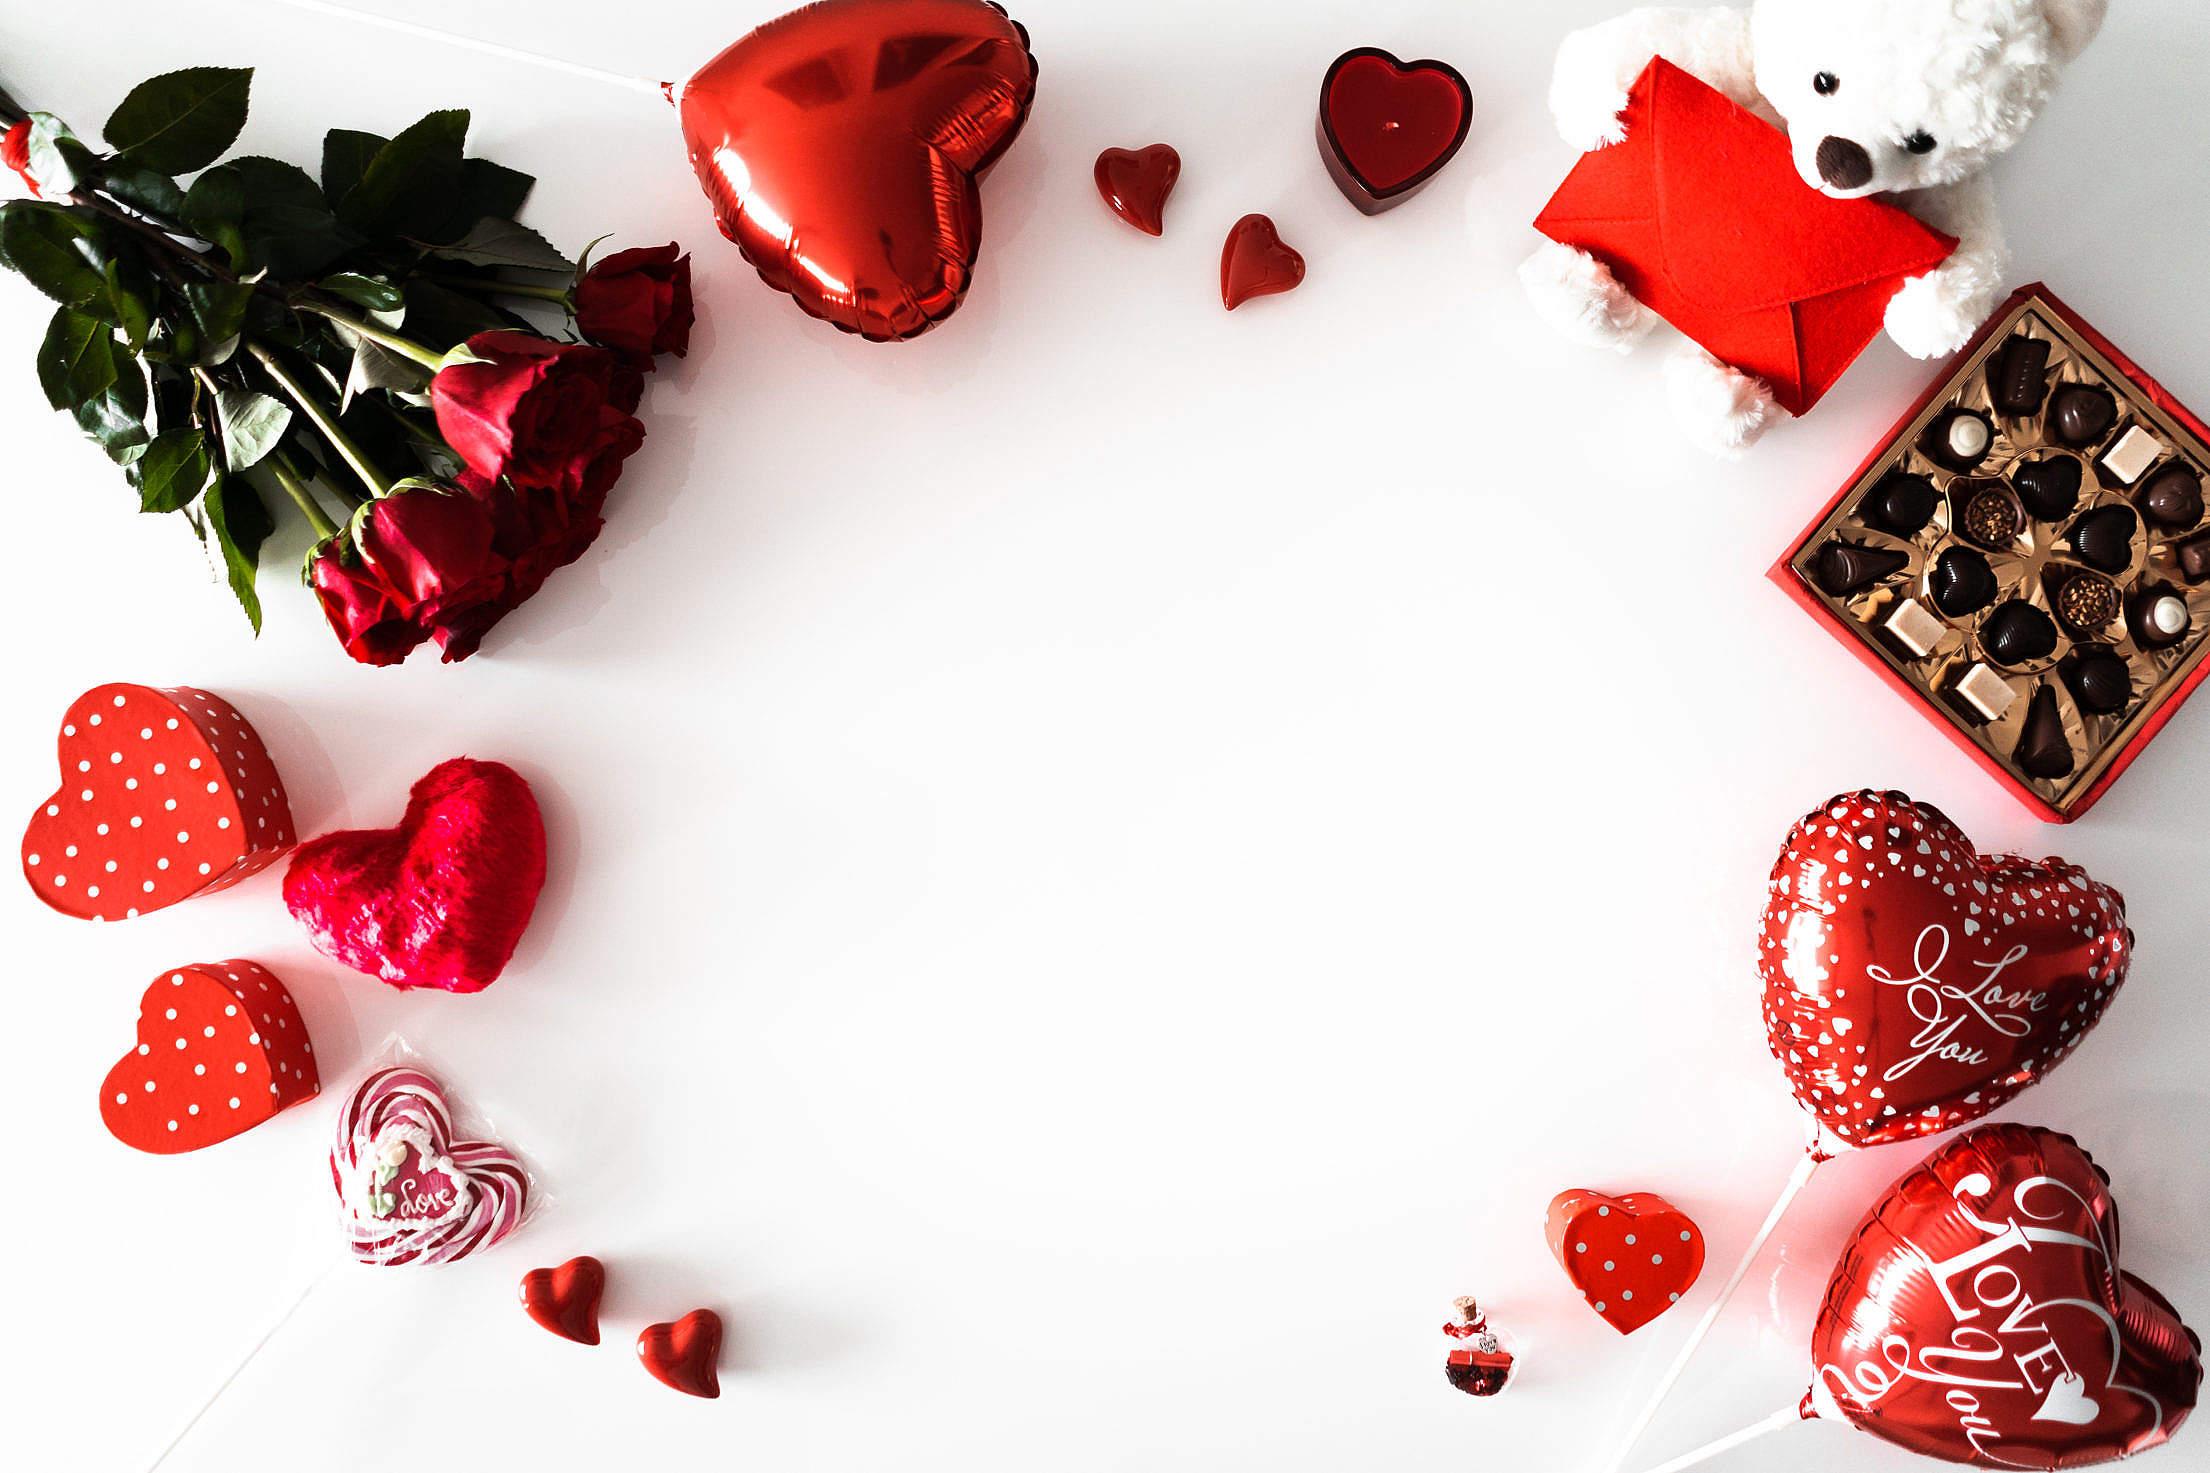 Valentines Day Background Free Stock Photo